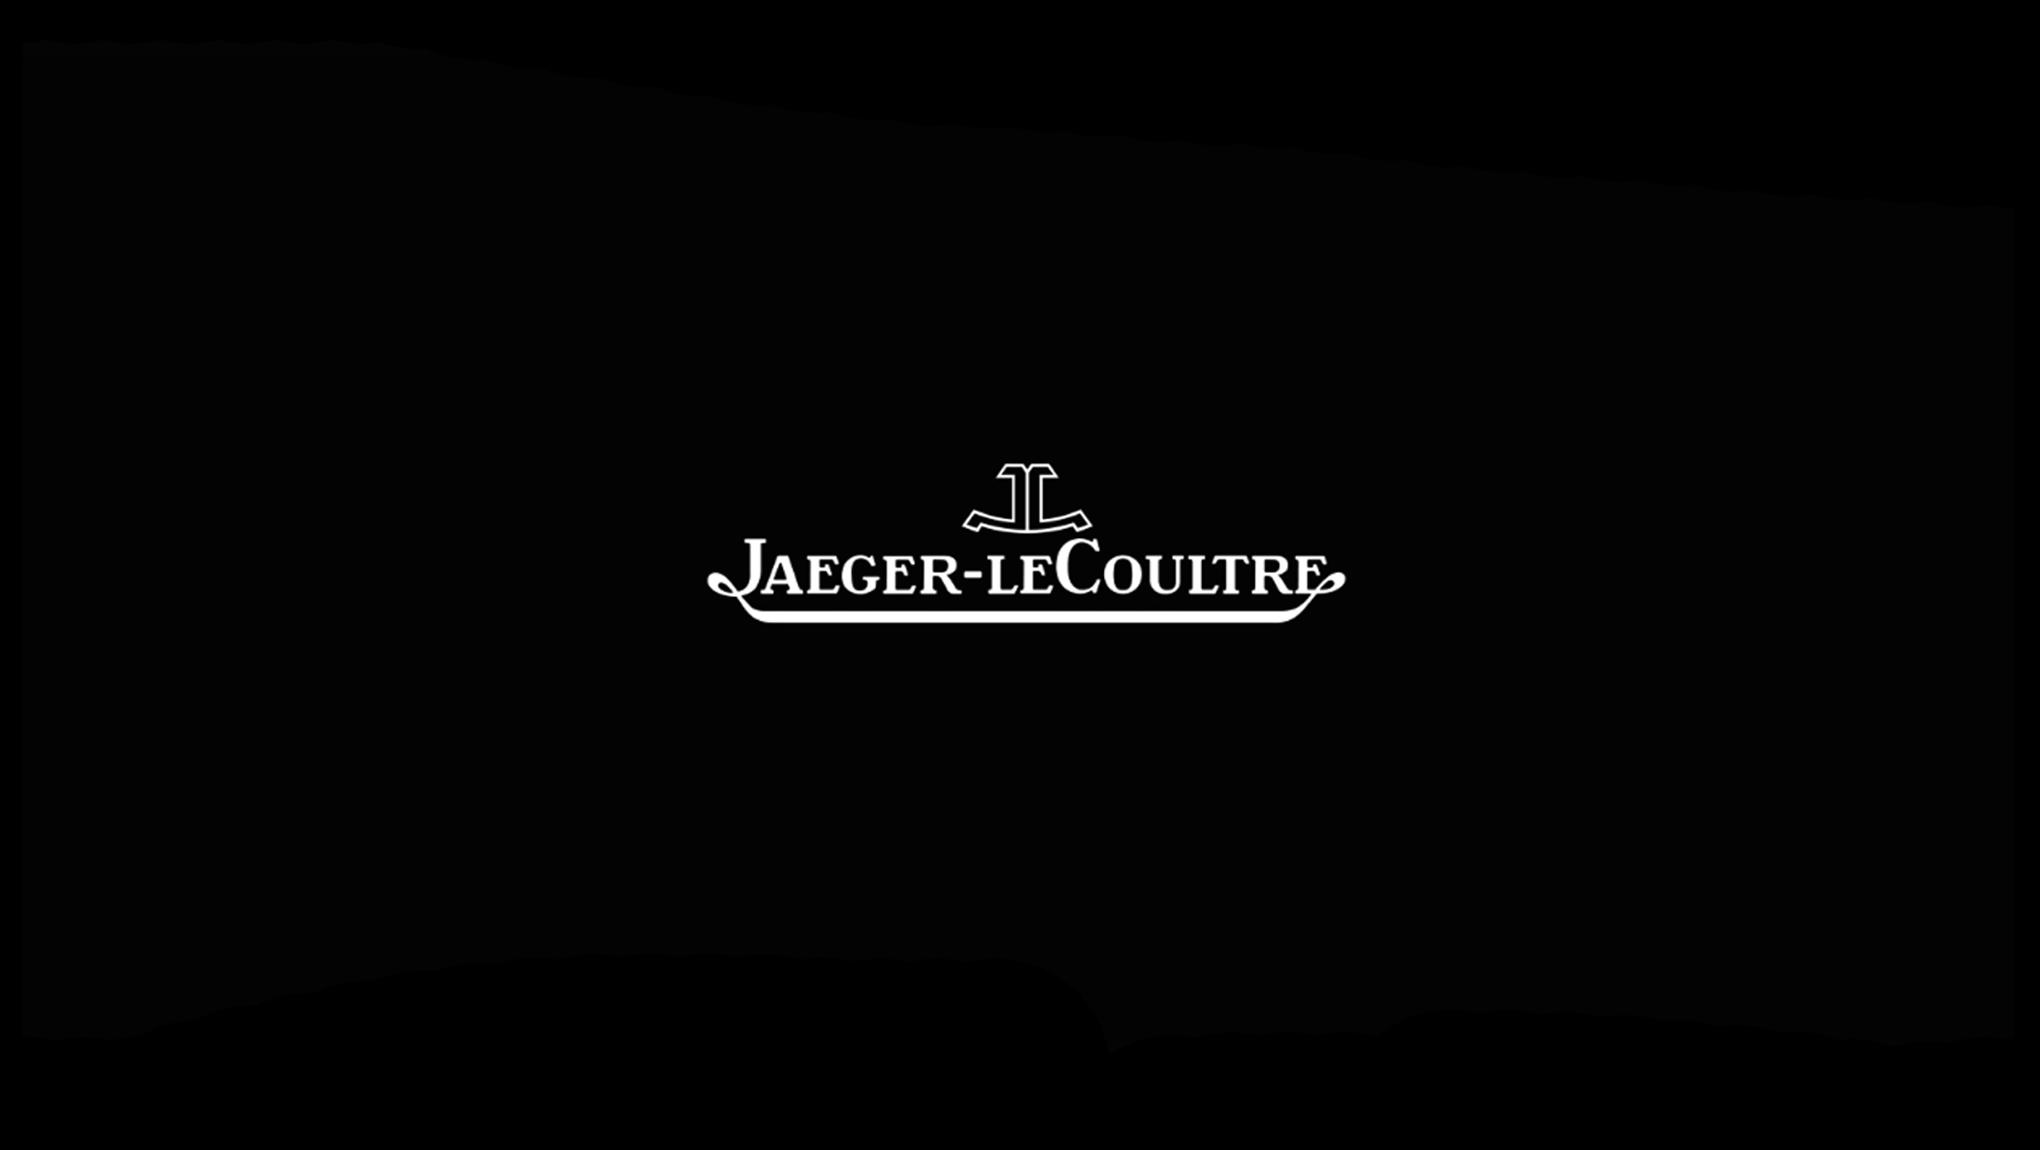 Jaeger-LeCoultre,cheyan antwaune gray, cheyan gray, antwaune gray, thelifestyleelite,elite lifestyle, thelifestyleelitedotcom, thelifestyleelite.com,cheyan antwaune gray,fashion,models of thelifestyleelite.com, the life style elite,the lifestyle elite,elite lifestyle,lifestyleelite.com,cheyan gray,TLSElite,TLSElite.com,TLSEliteGaming,TLSElite Gaming